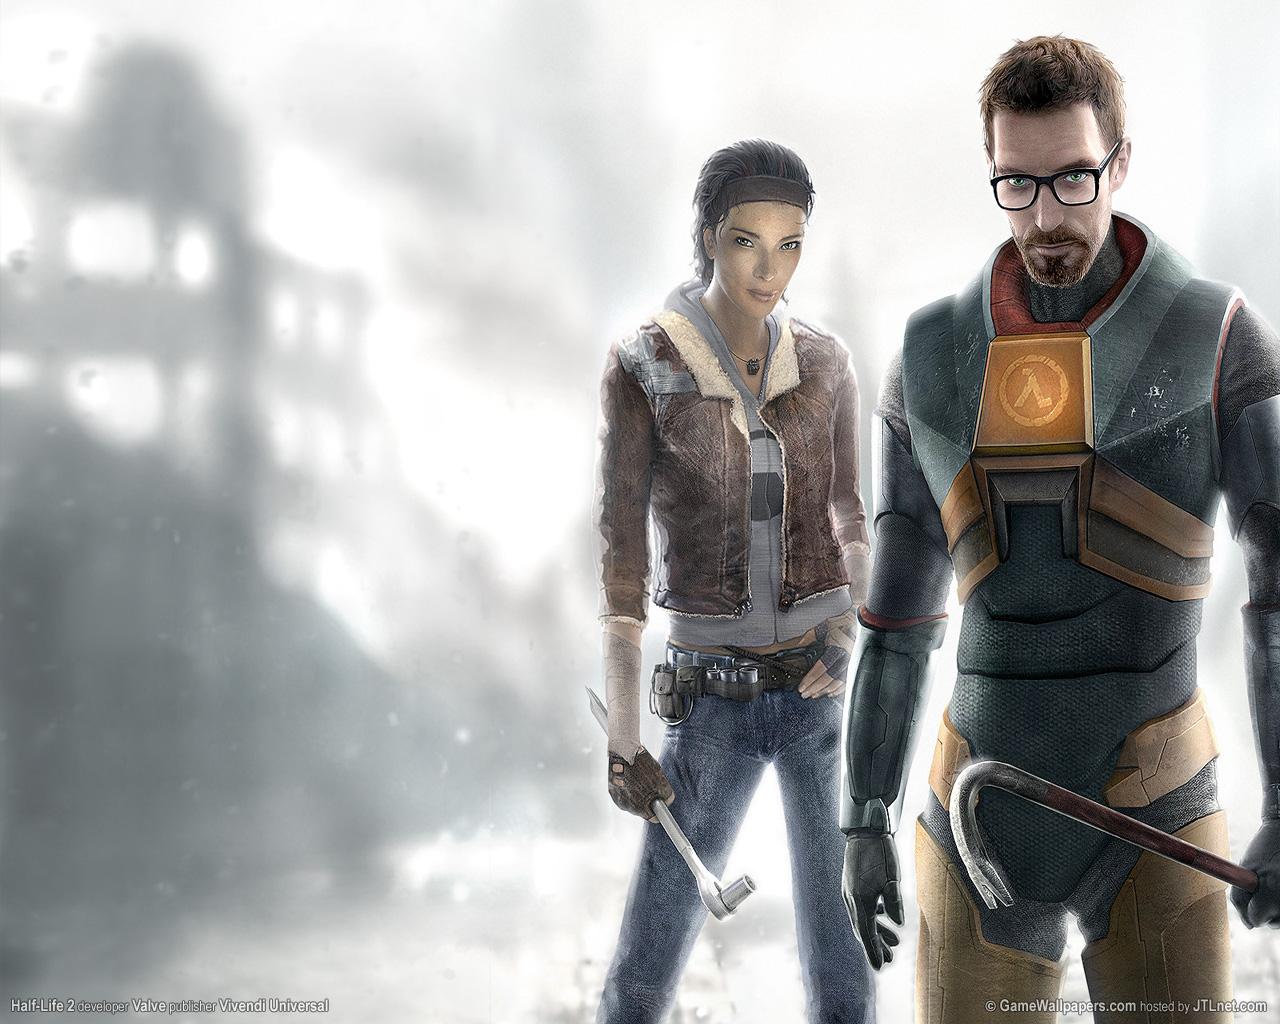 How Valve can announce Half-Life 3